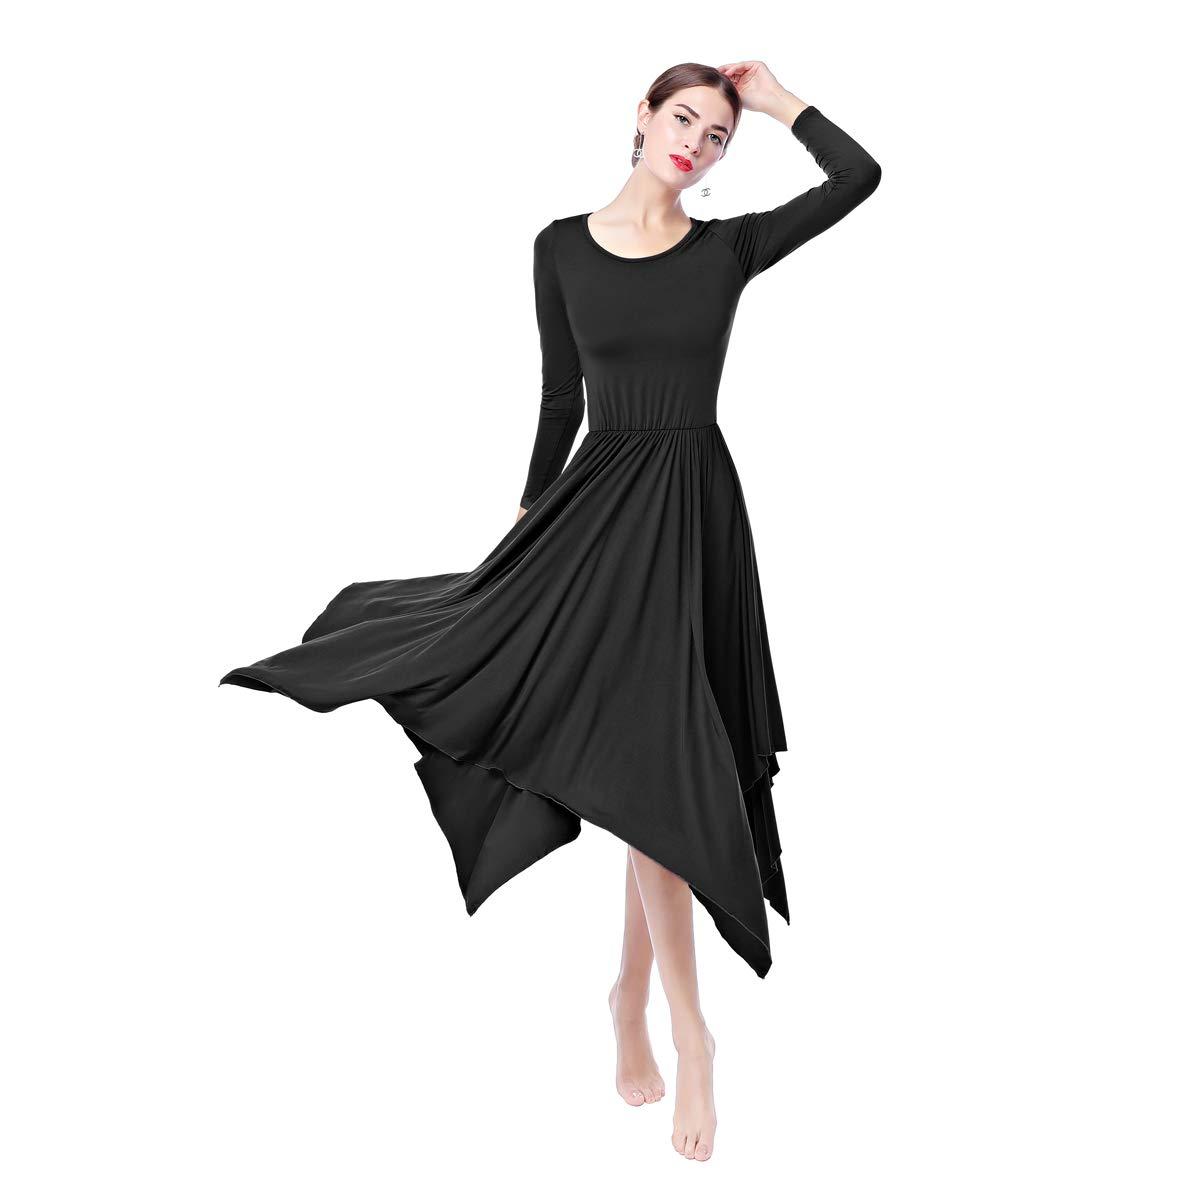 IBTOM IBTOM CASTLE DRESS CASTLE レディース B07DNWM2VV Large|ブラック DRESS ブラック Large, Welina-kids:d4d037e8 --- ijpba.info